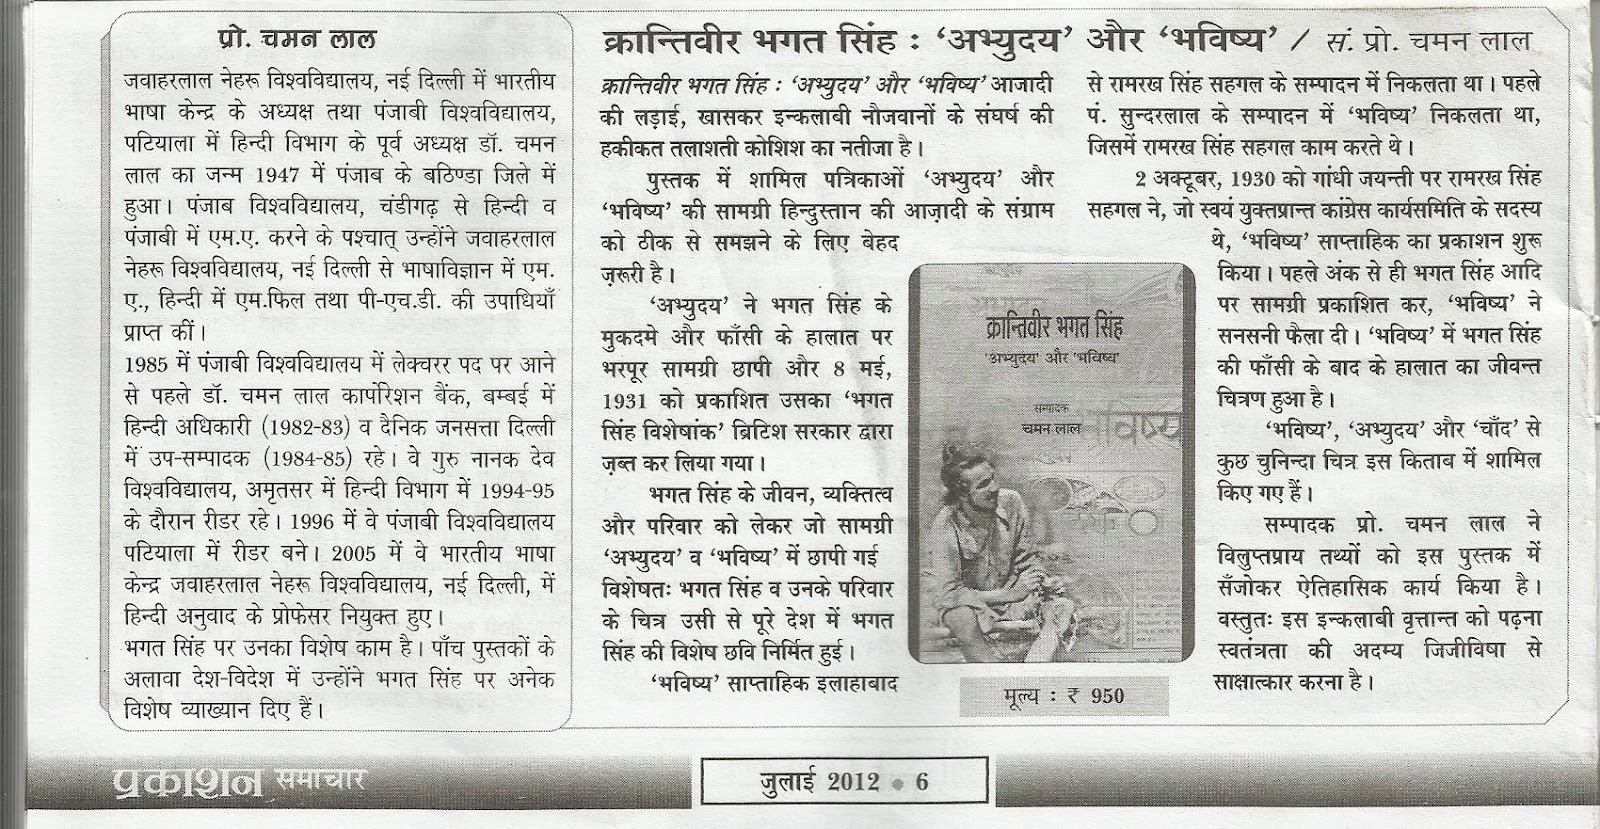 003 Essay On Bhagat Singh In Marathi Example Titleofnewbookonbhagatsinghinhindi Unique Short 100 Words Full